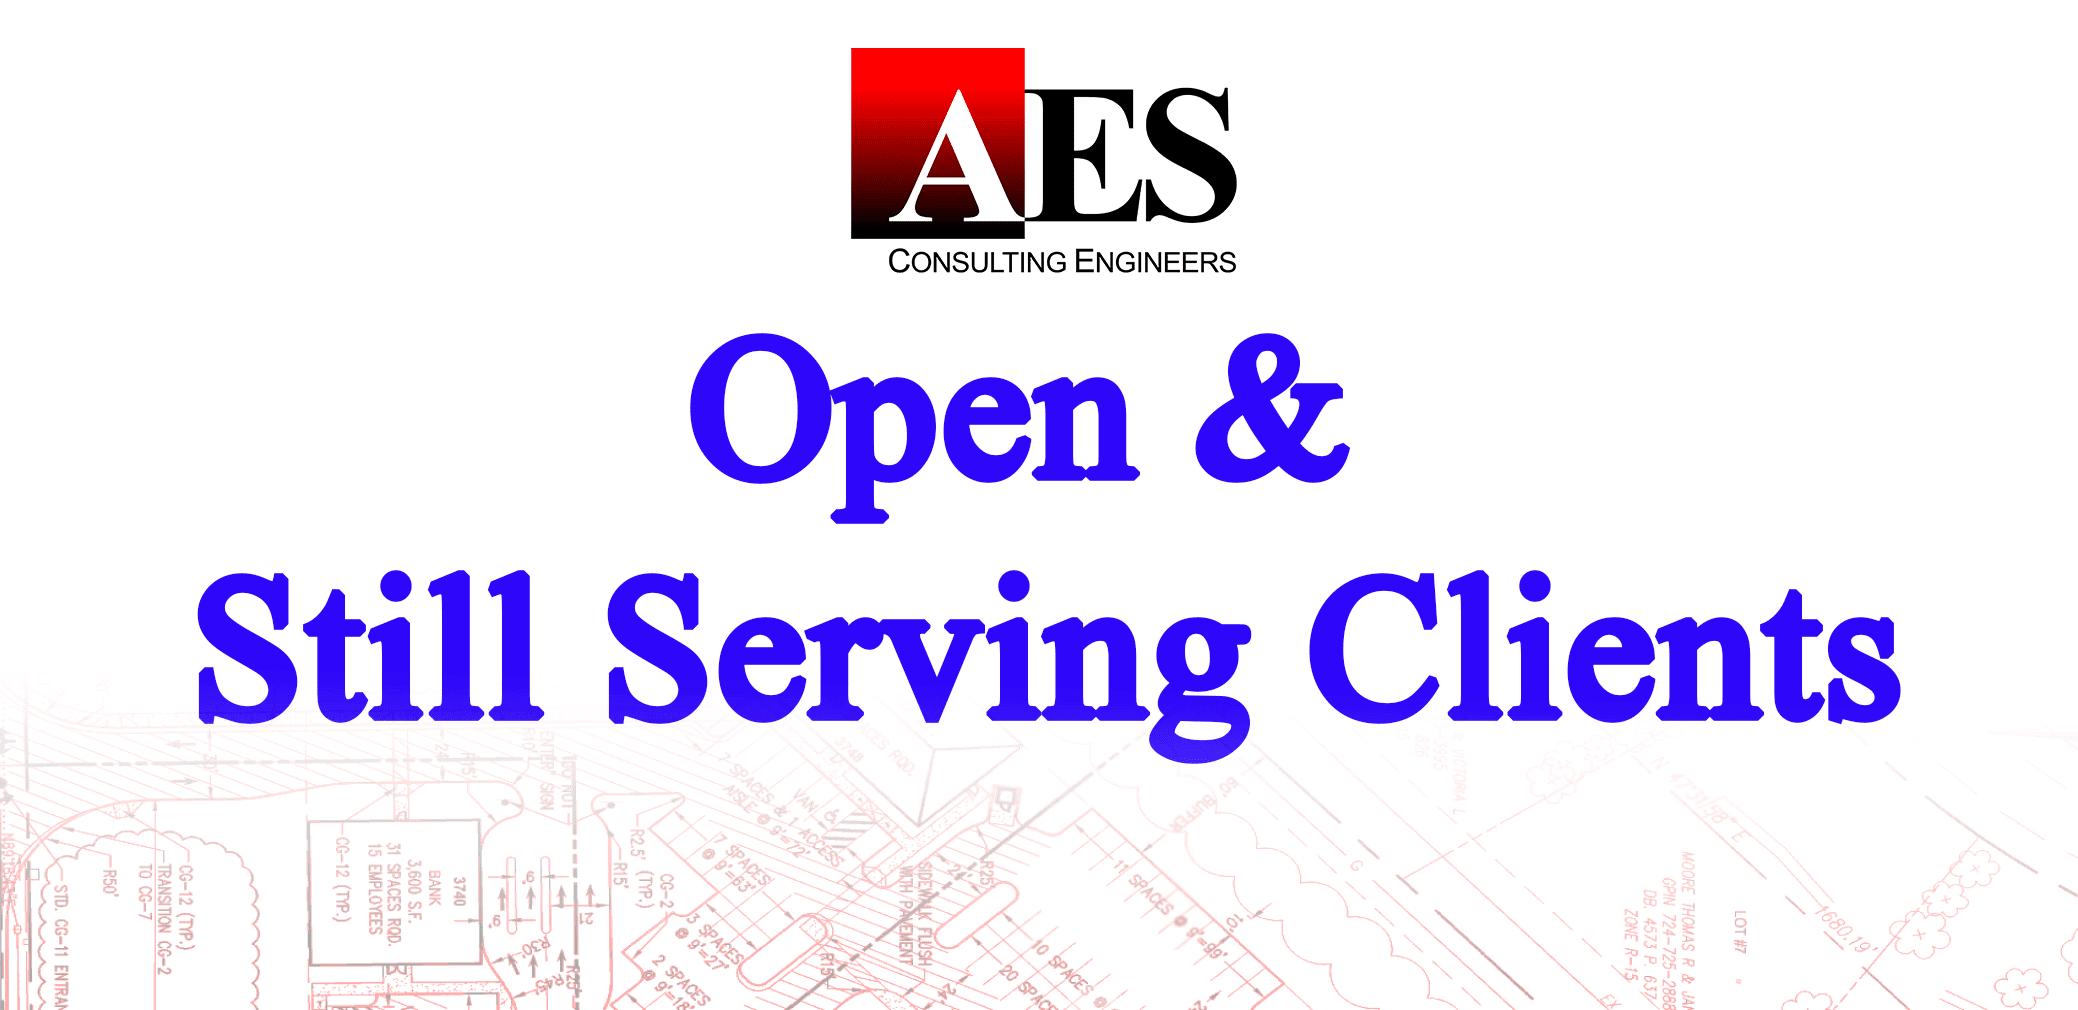 AES Open